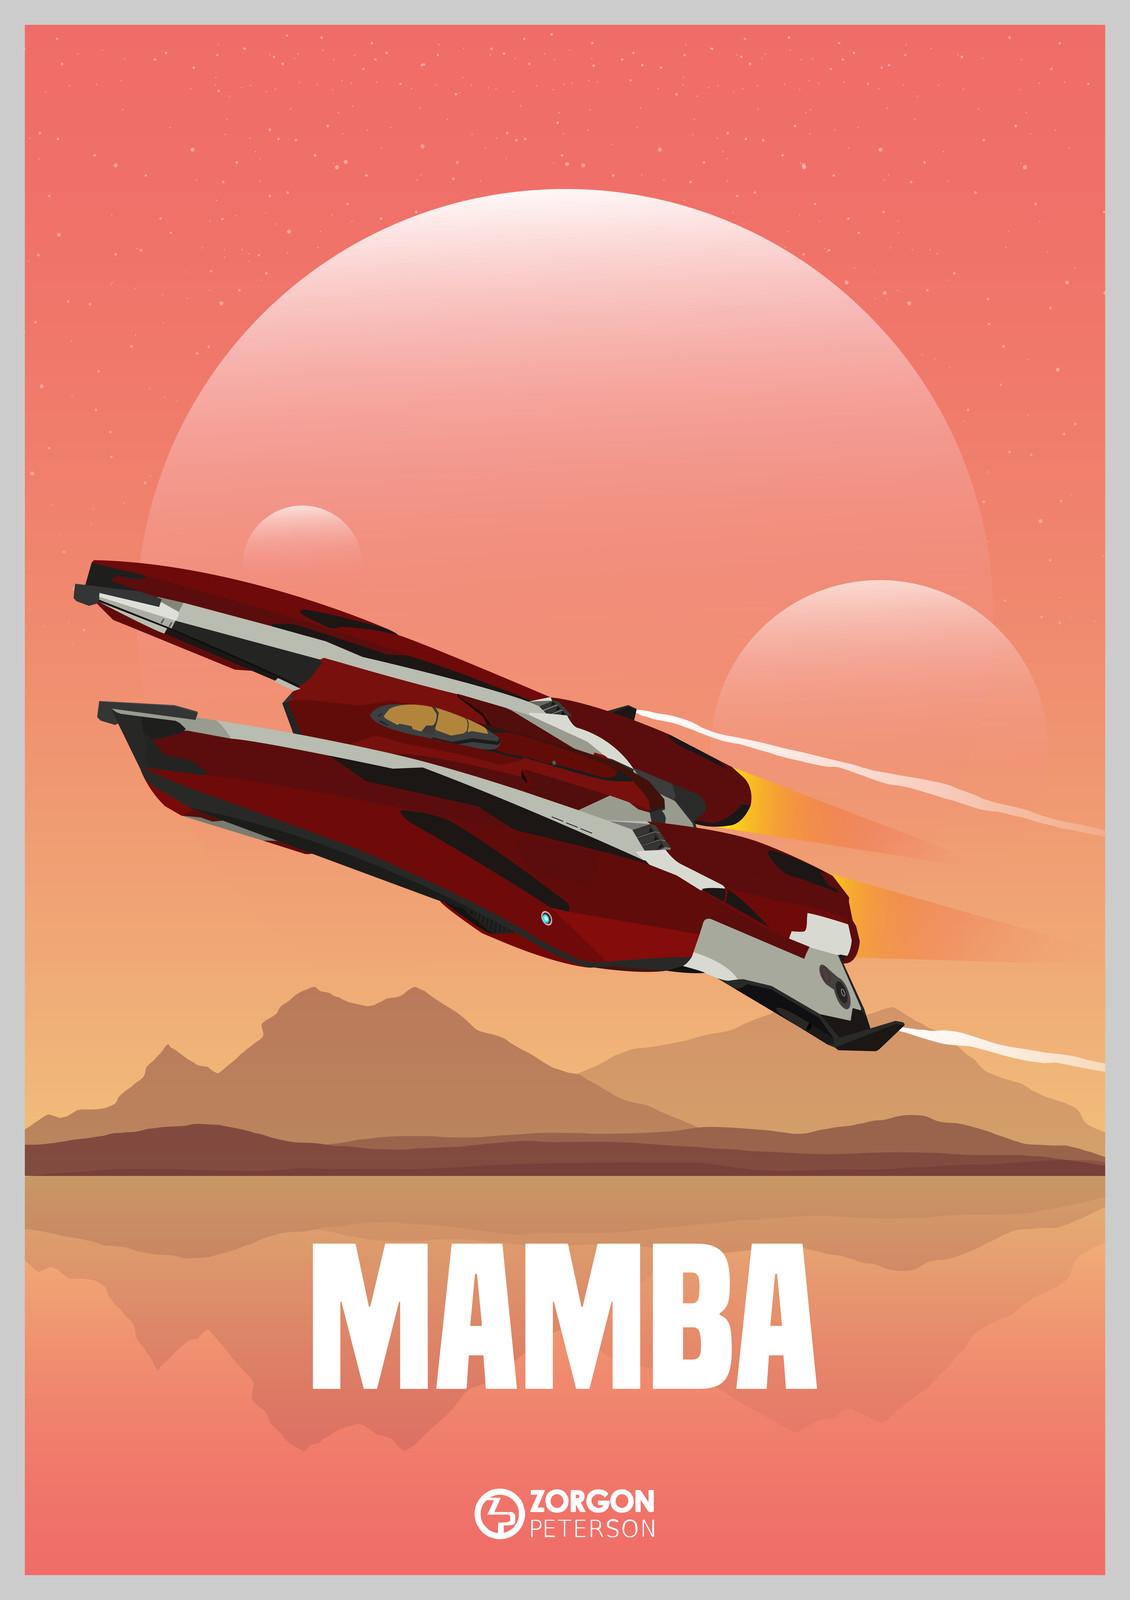 Elite Dangerous - Mamba Poster